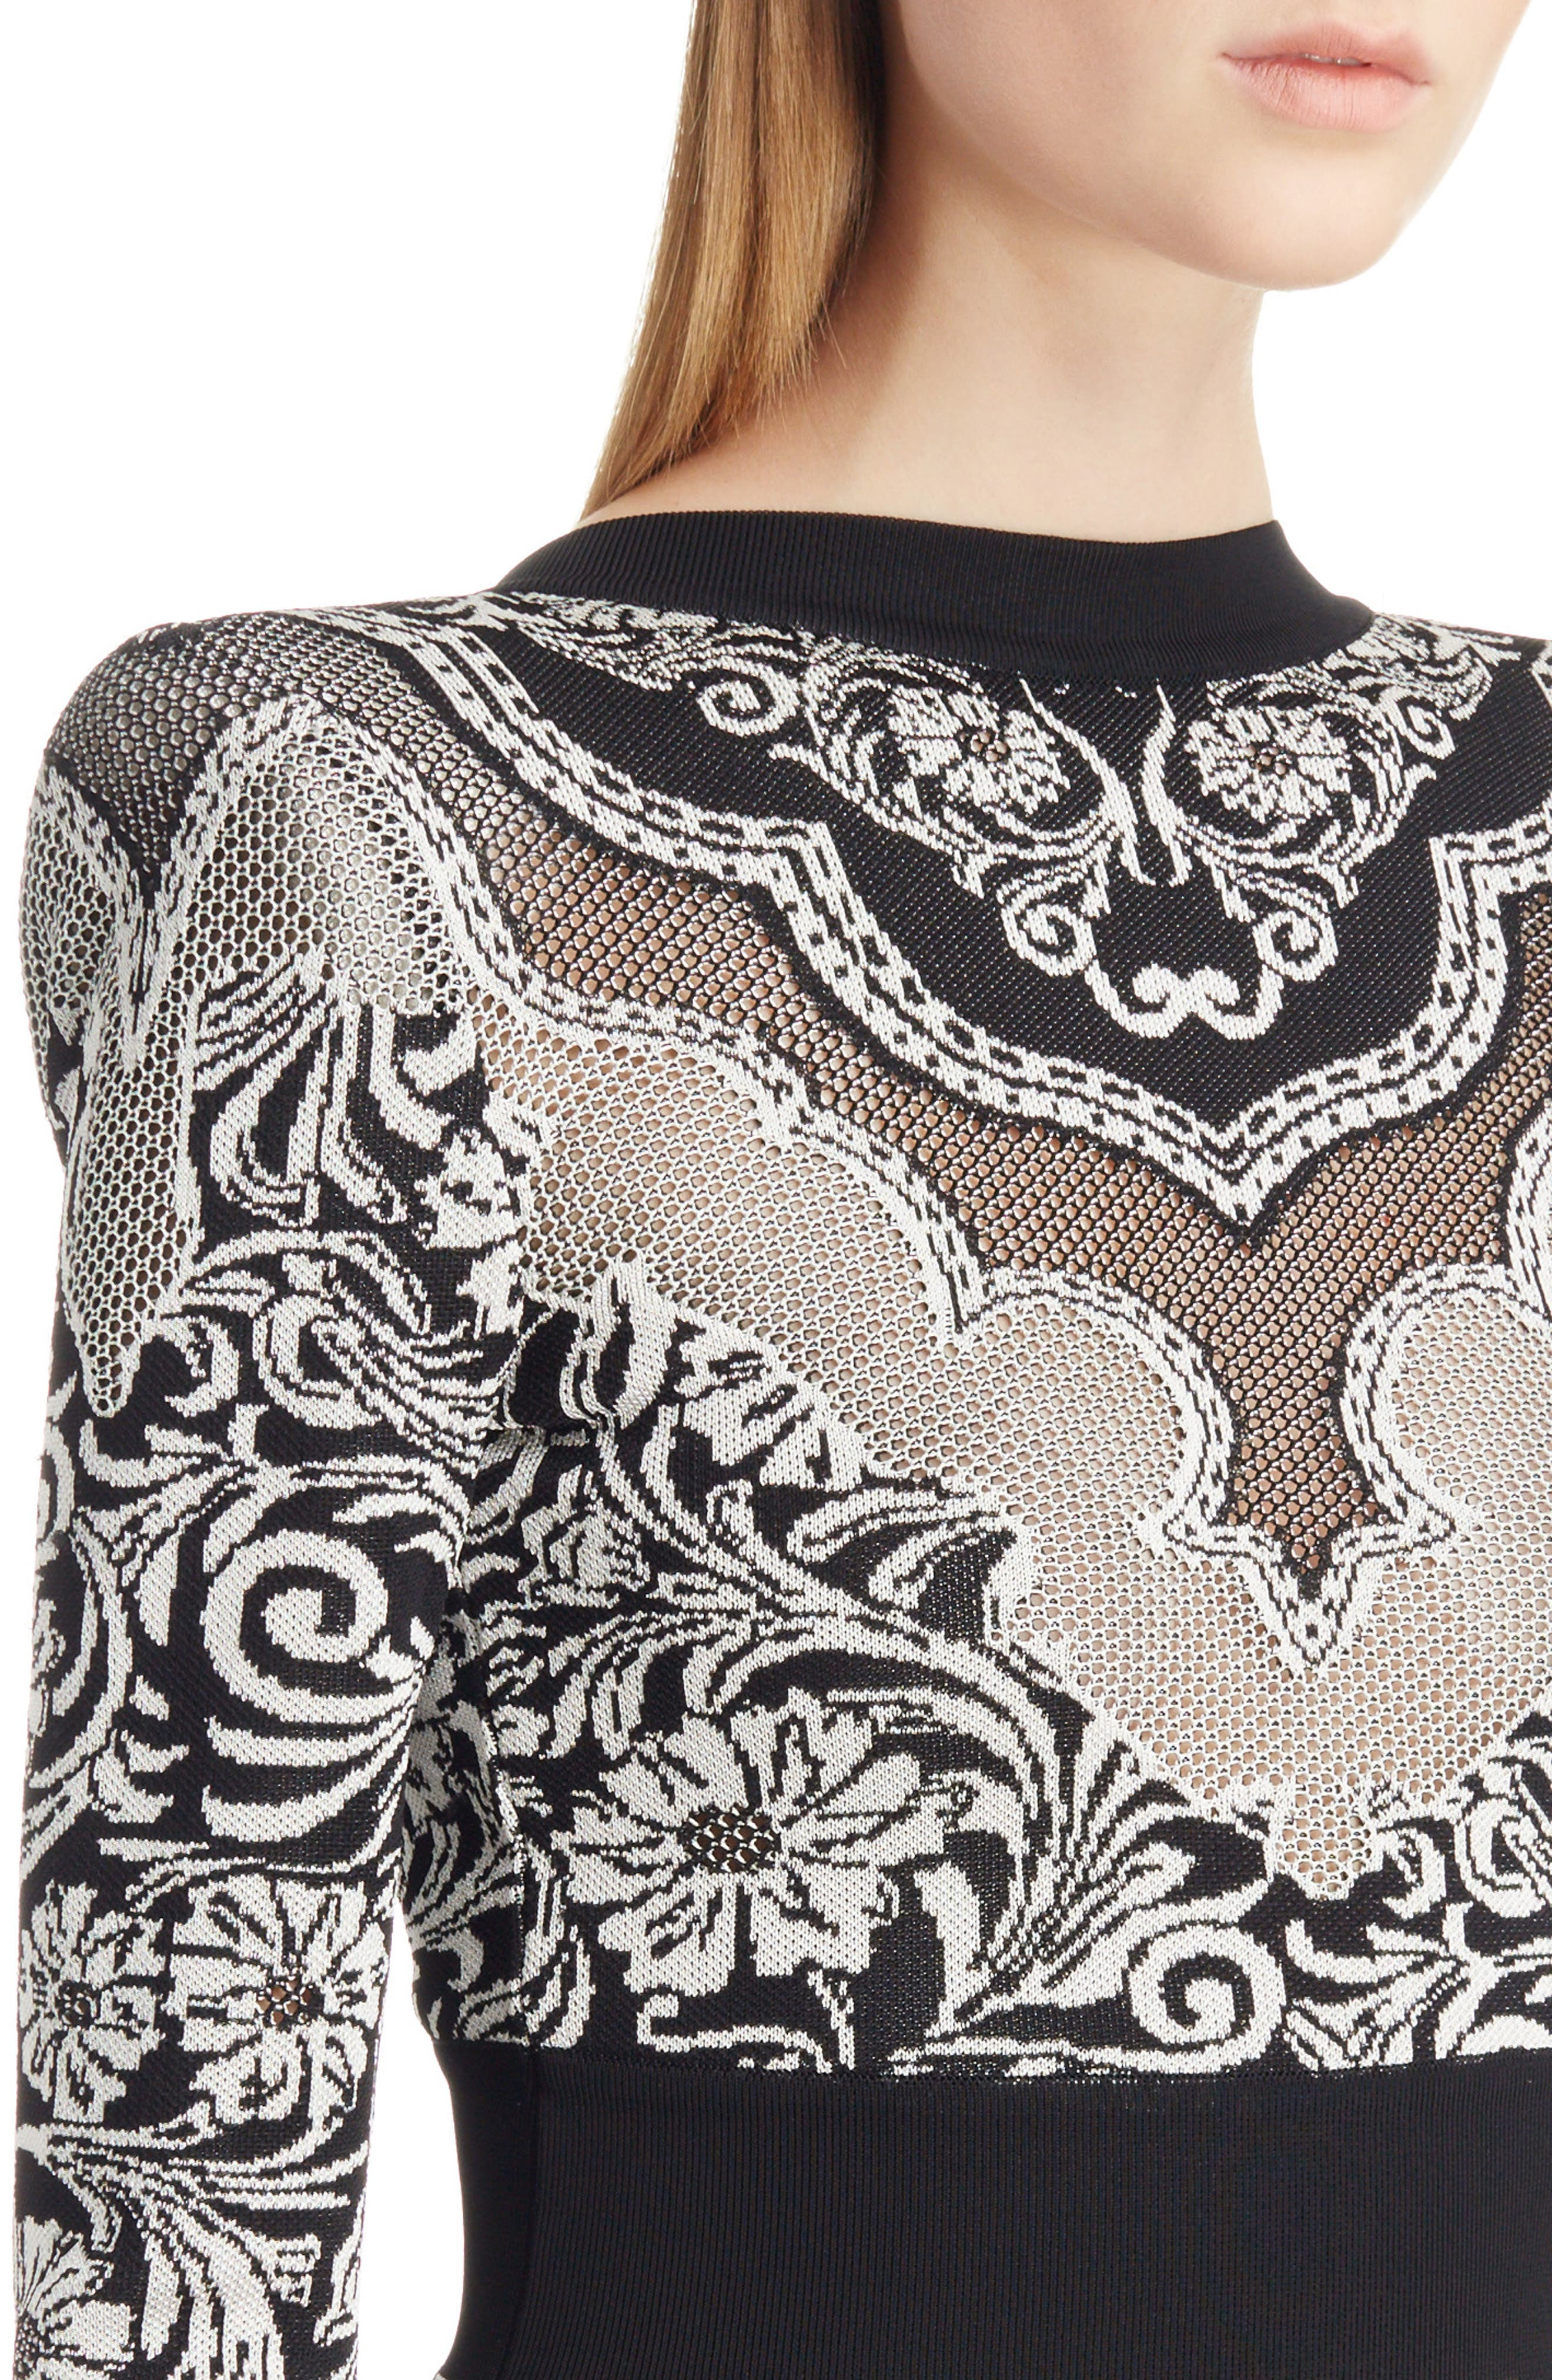 Baroque Knit Minidress,                             Alternate thumbnail 4, color,